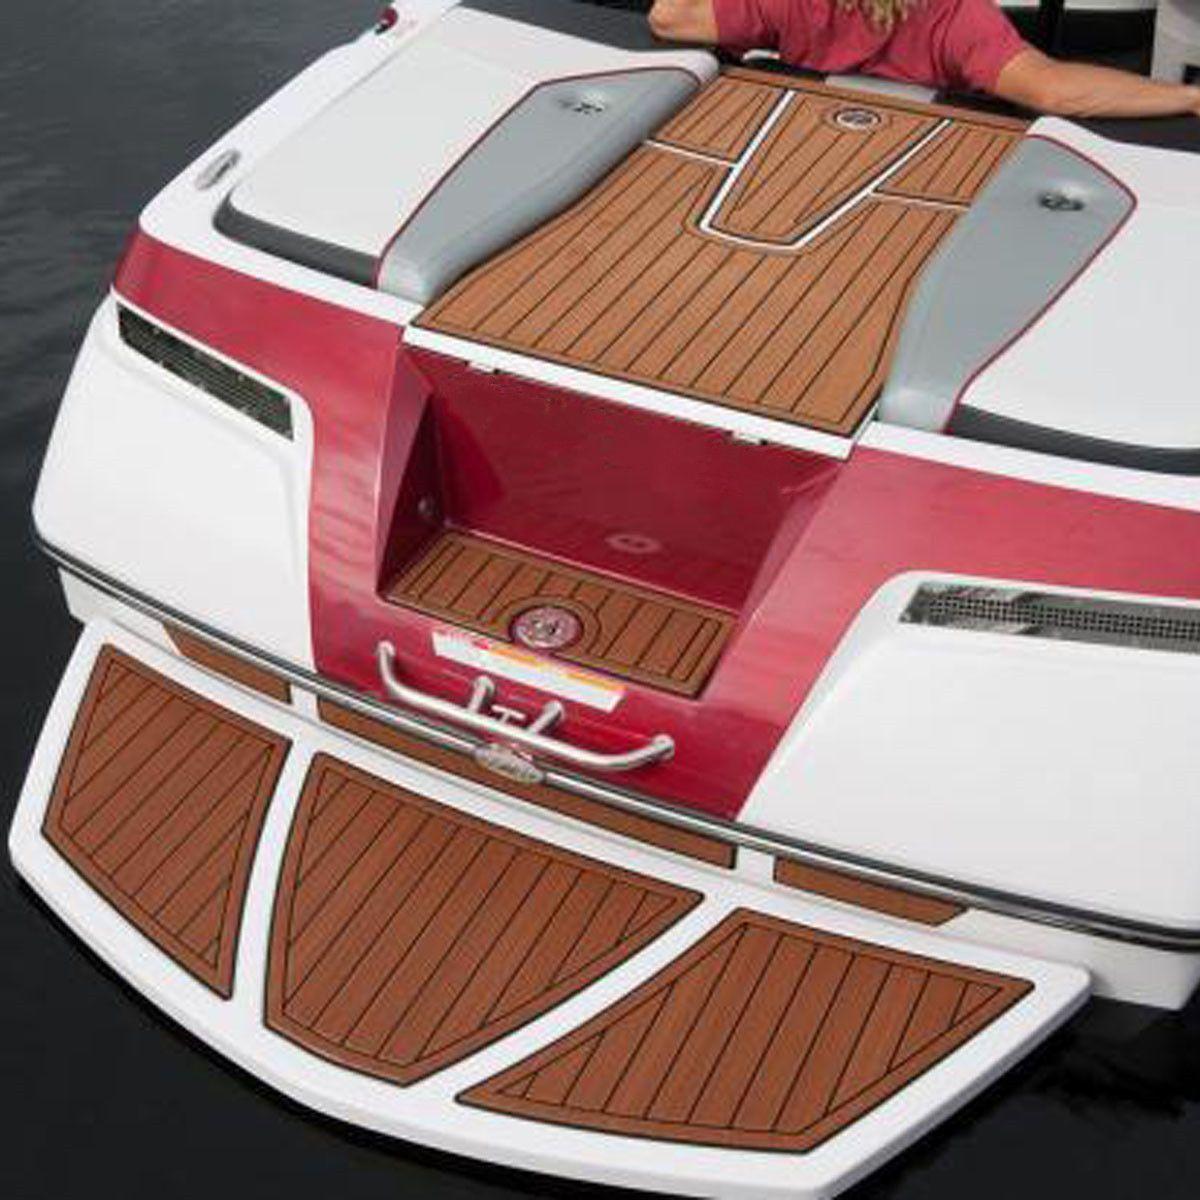 58x2400x5mm Self Adhesive EVA Boat Yacht Flooring Teak Decking Carpet Sheet Pad Foam Floor Mat for RV Motorhome Caravan